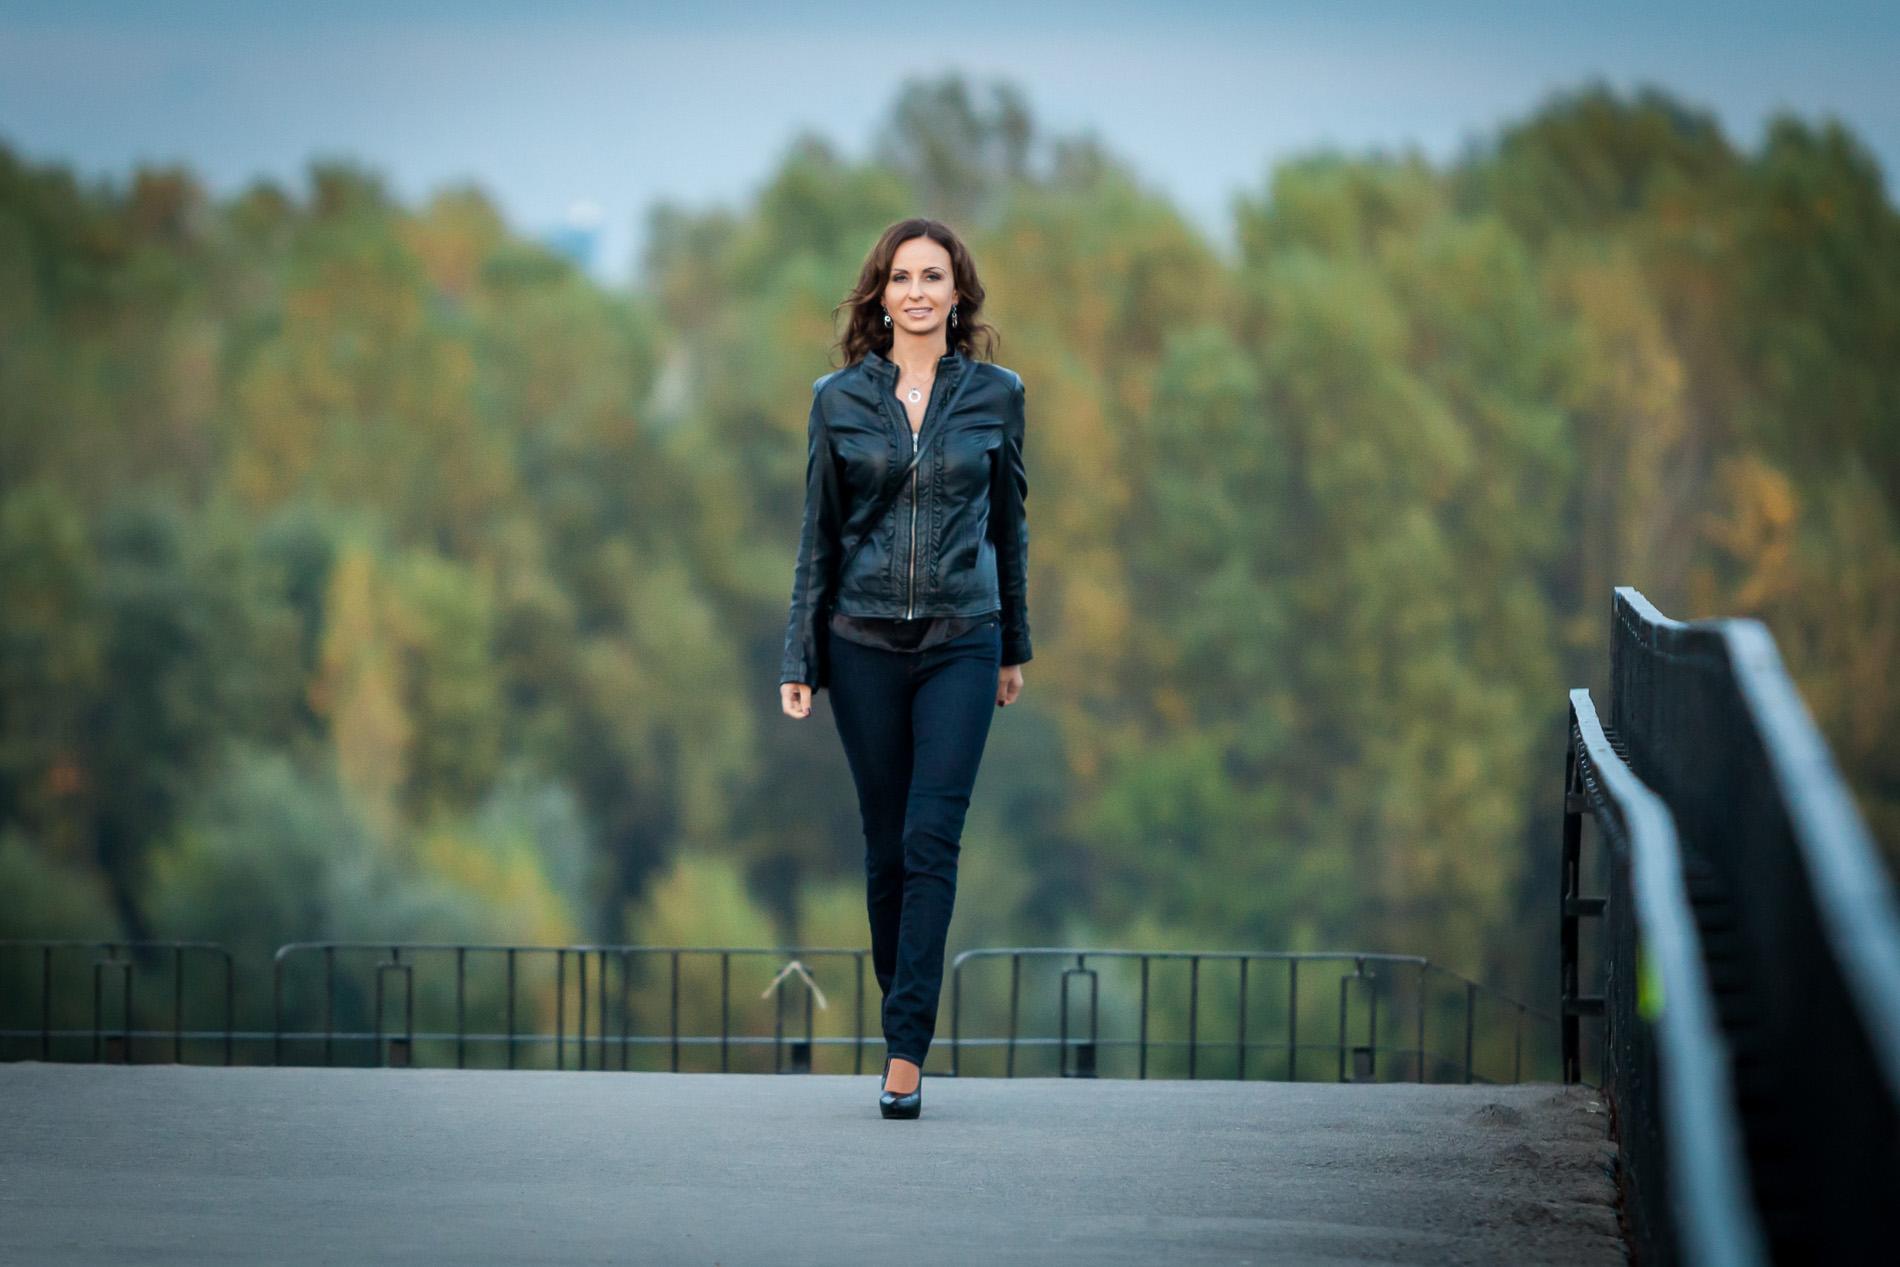 Sesja_Wizerunkowa_Outdoor_01